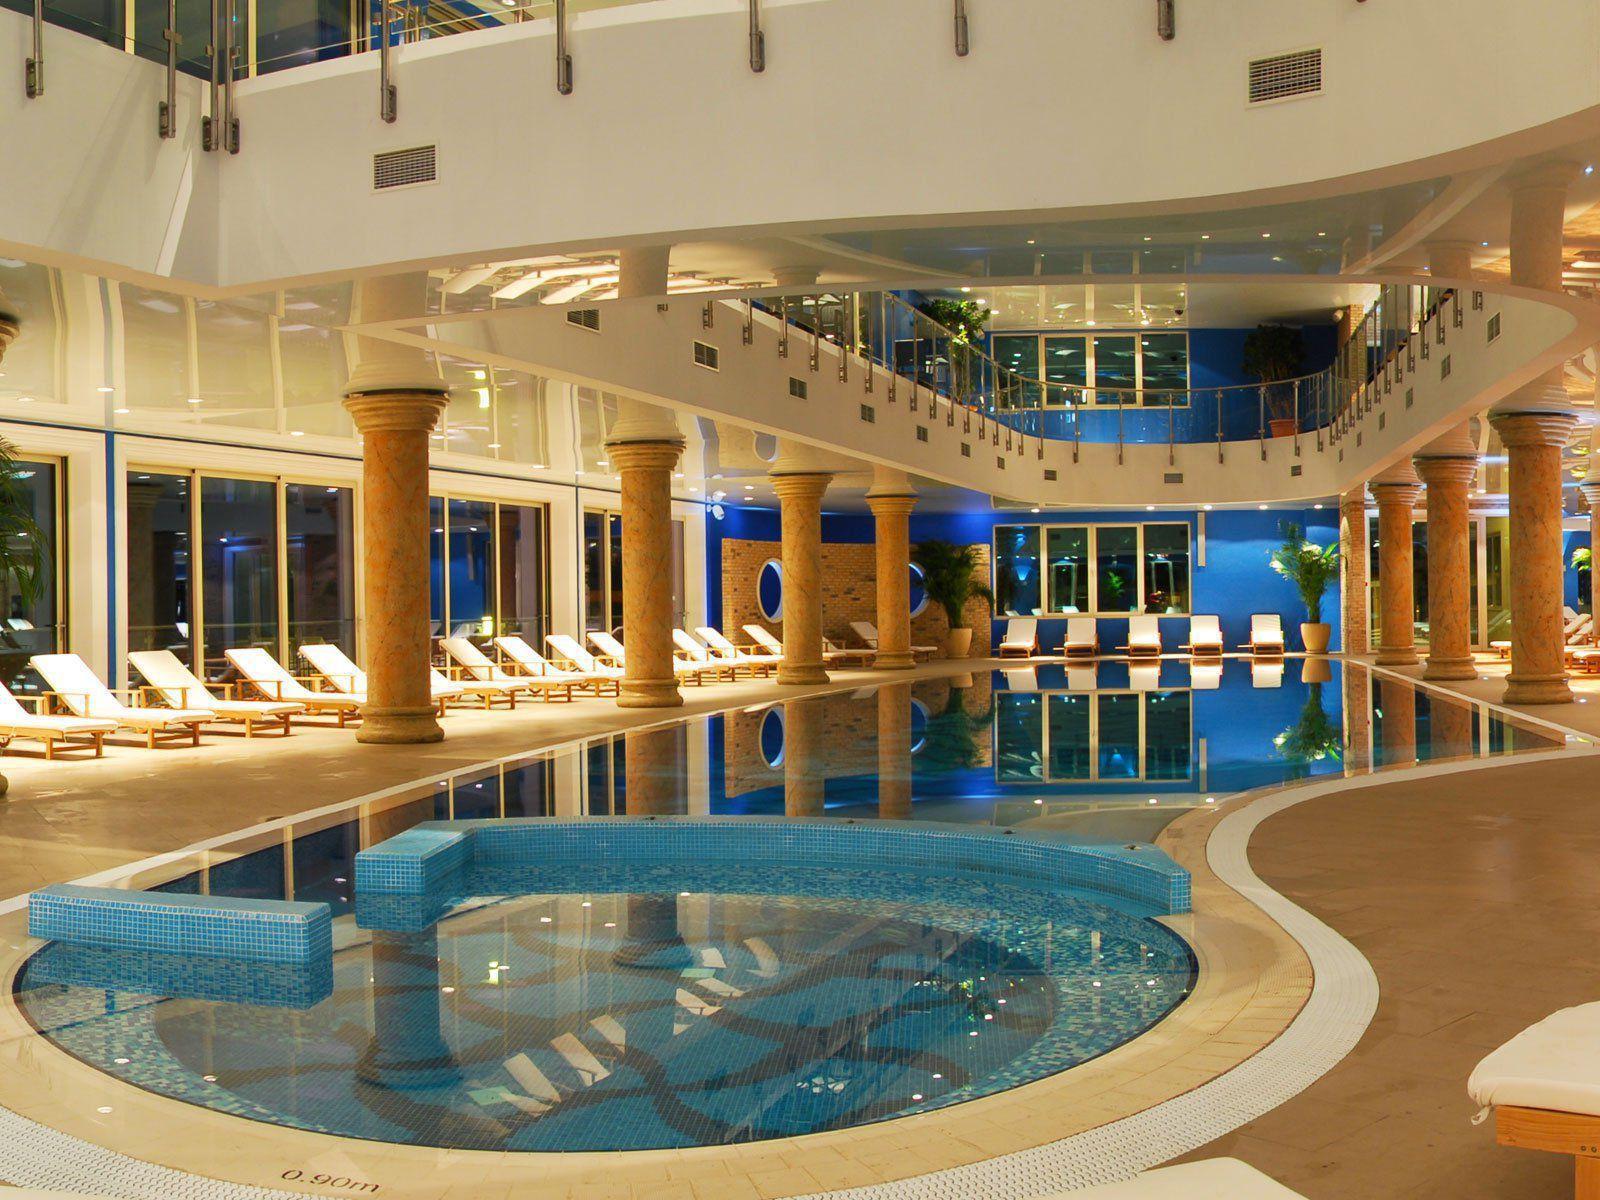 gotel-splendid-conference-spa-resort-5